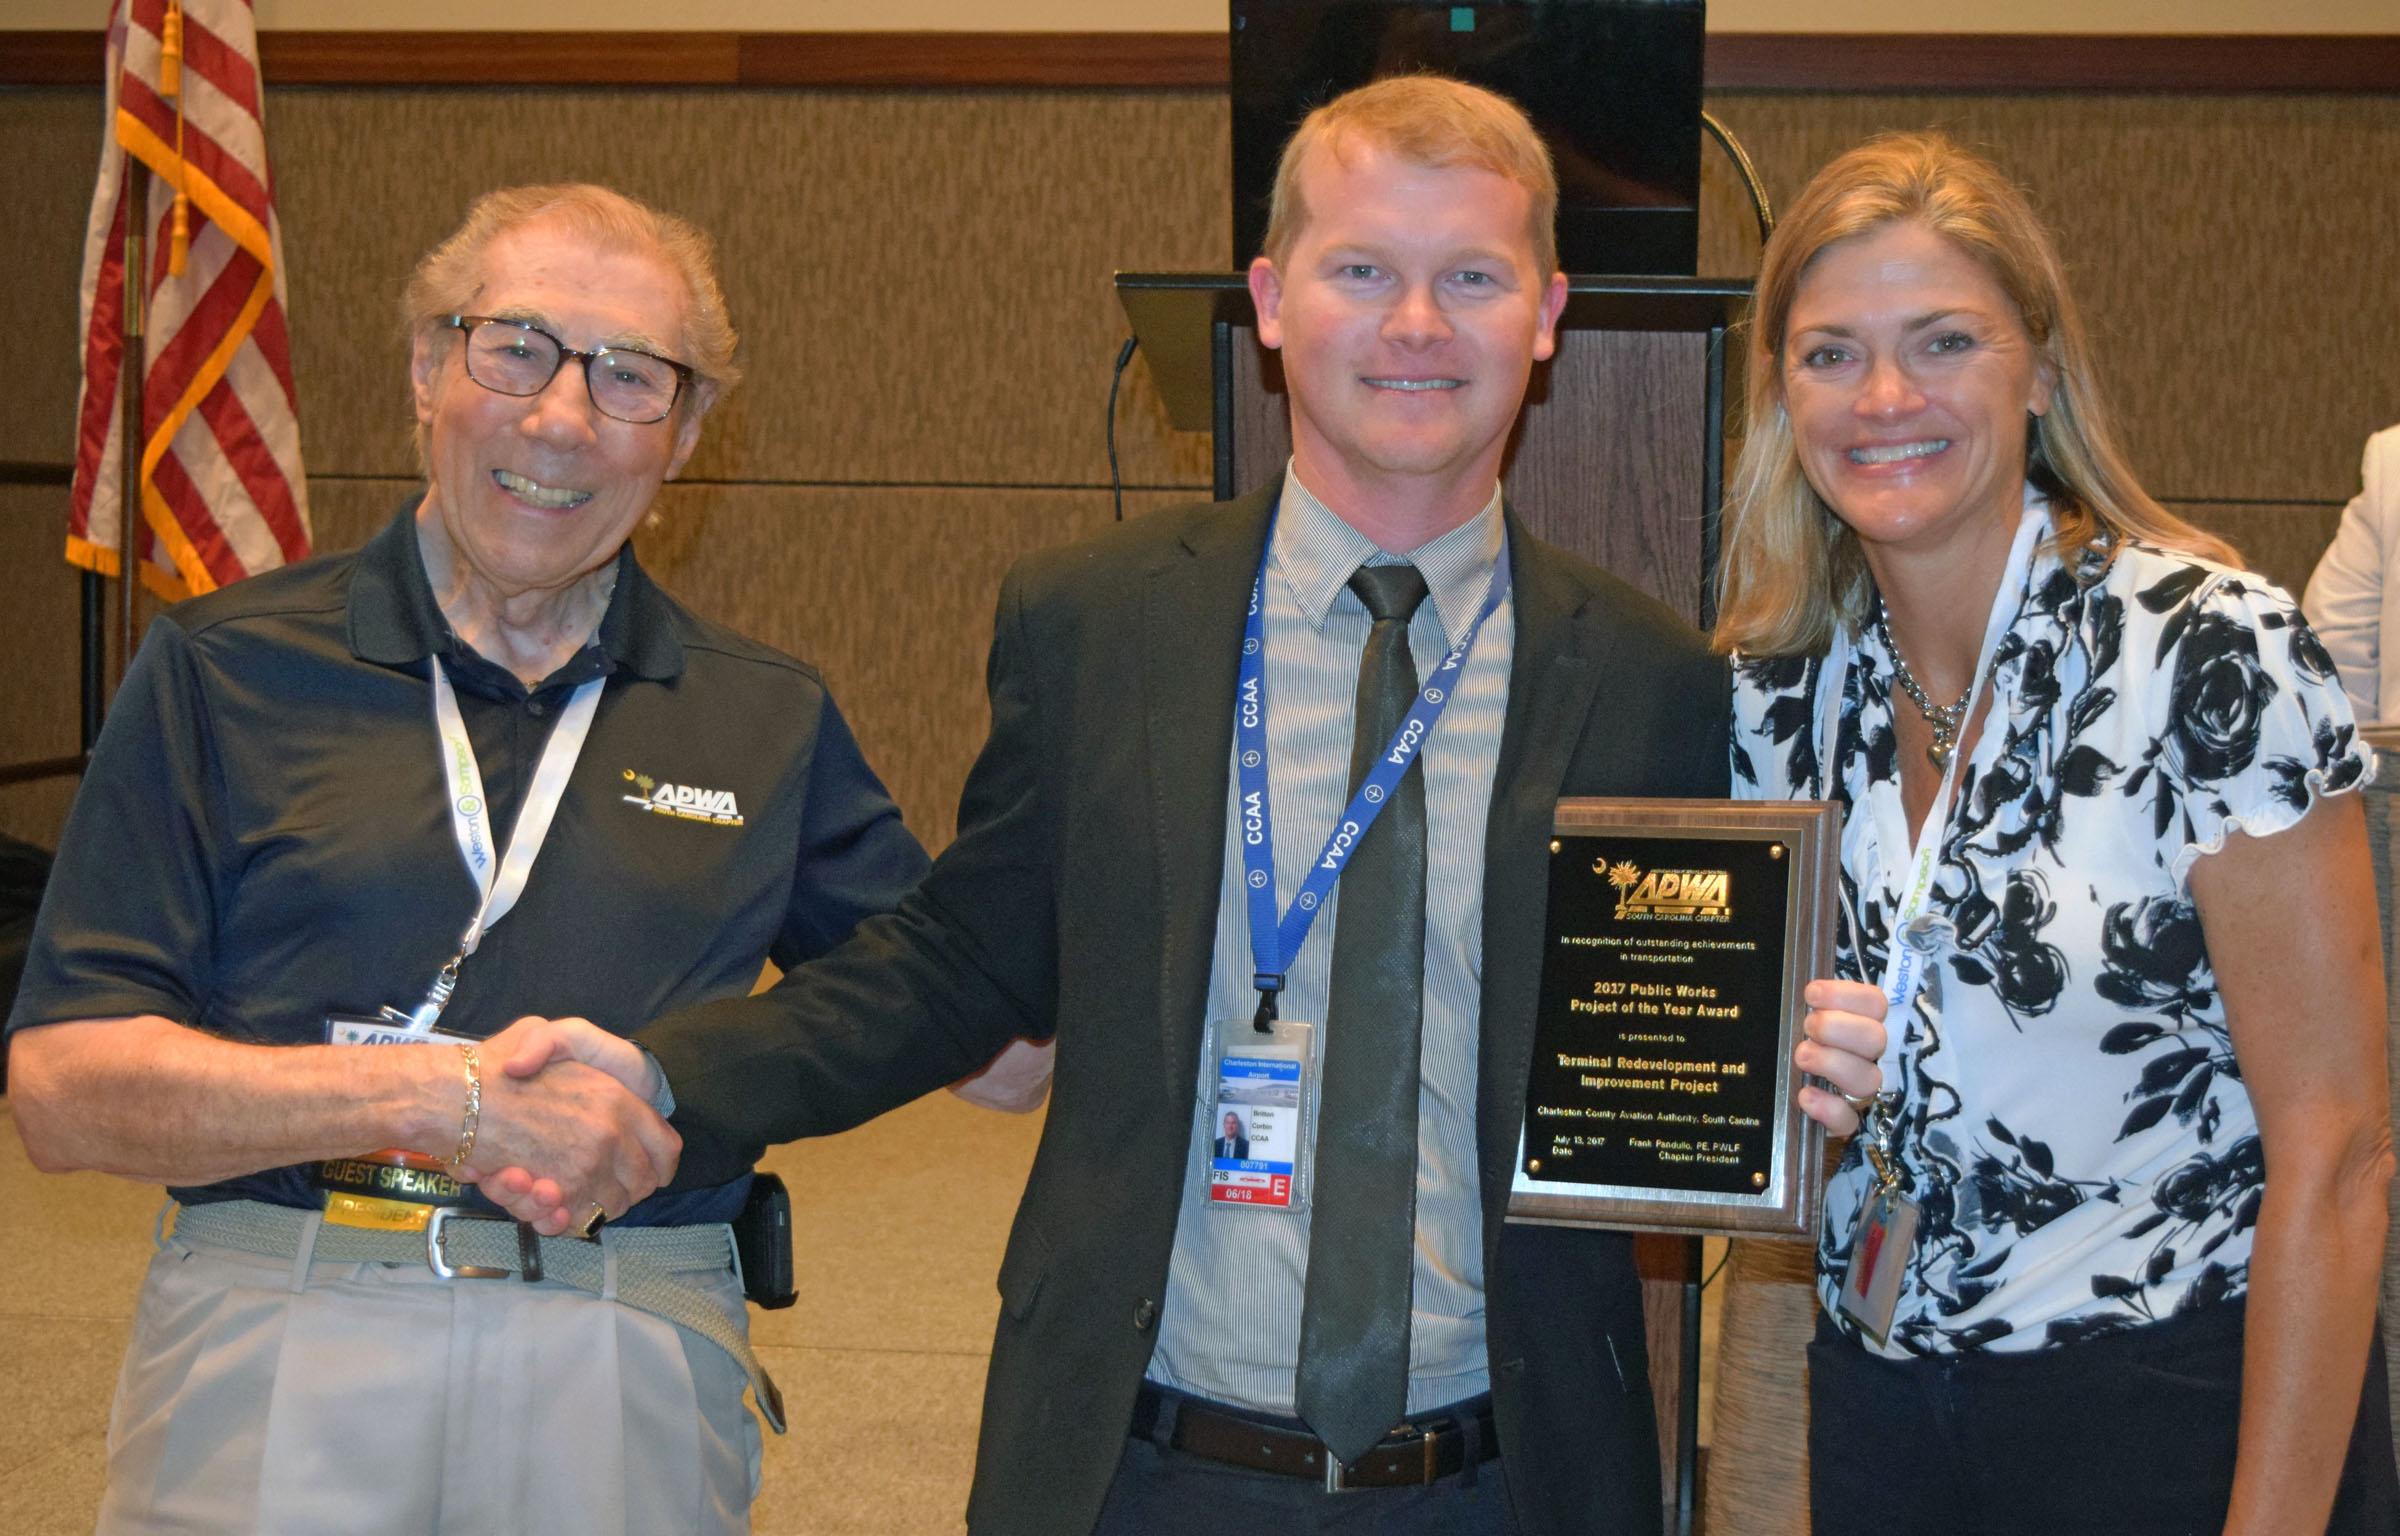 From left to right:SC APWA President Frank Pandullo, Britton Corbin, director of engineering, Charleston County Aviation Authority; Awards Chairperson Dana Higgins